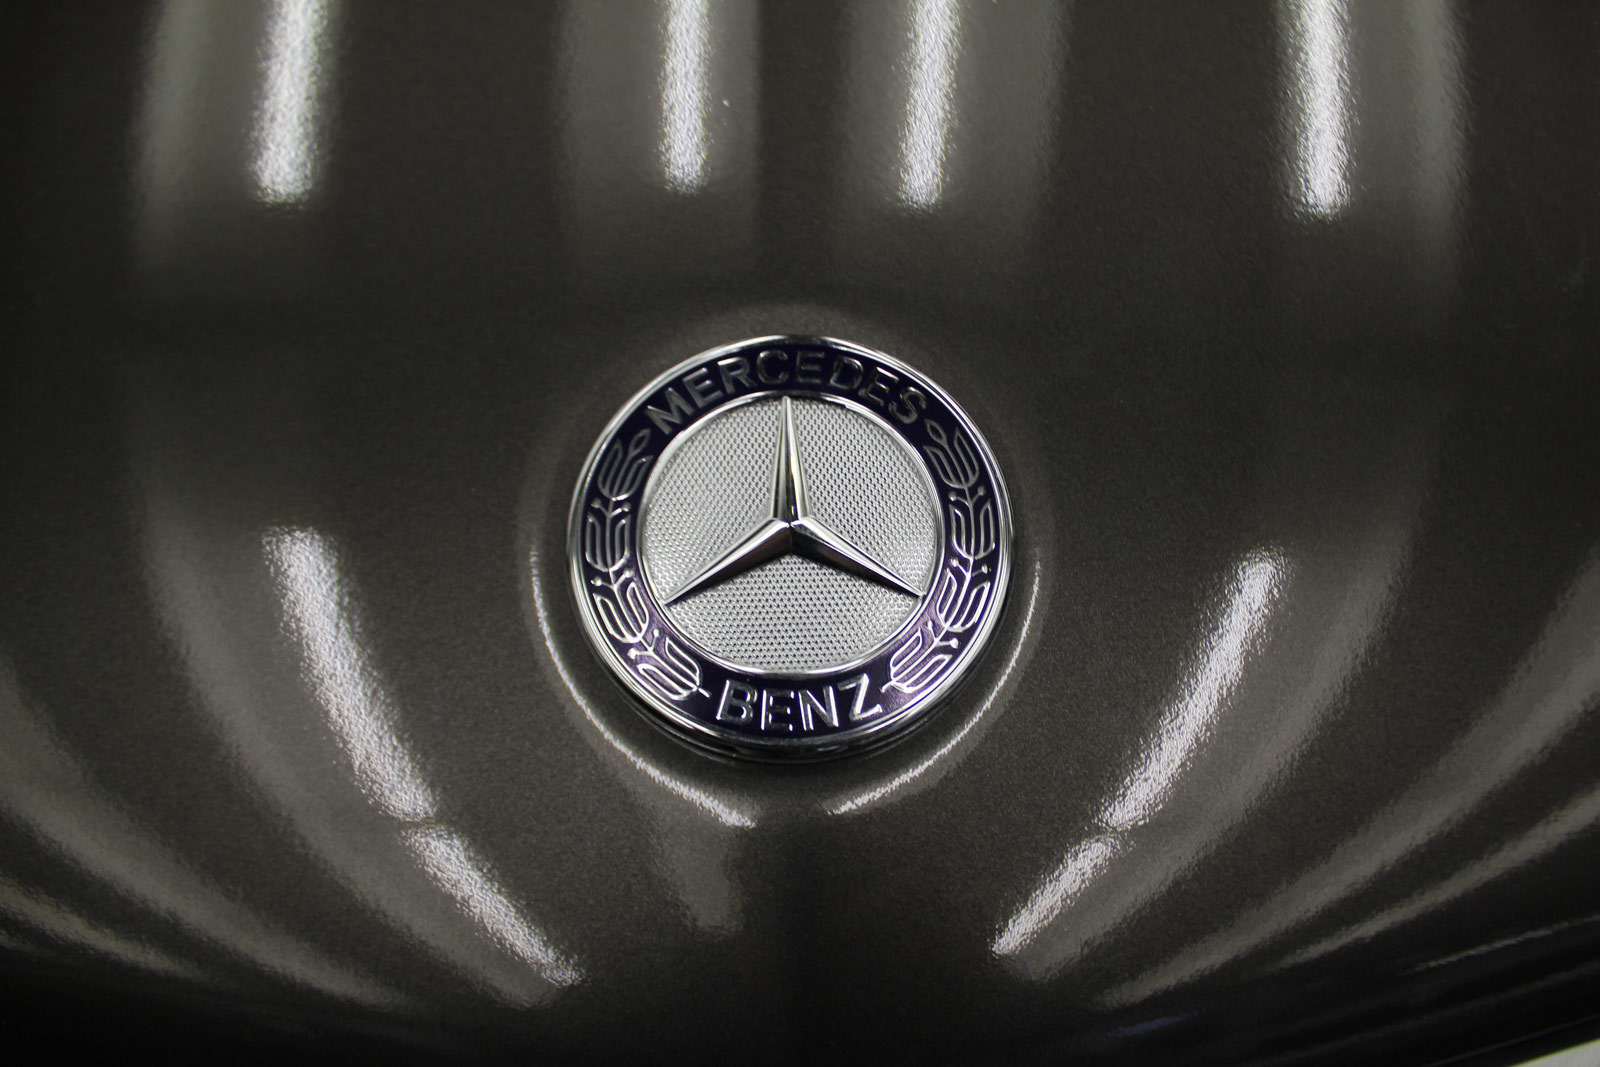 Mercedes_E-Klasse_Cabrio_Folierung_Stannitgrau_Metallic_Glanz_27